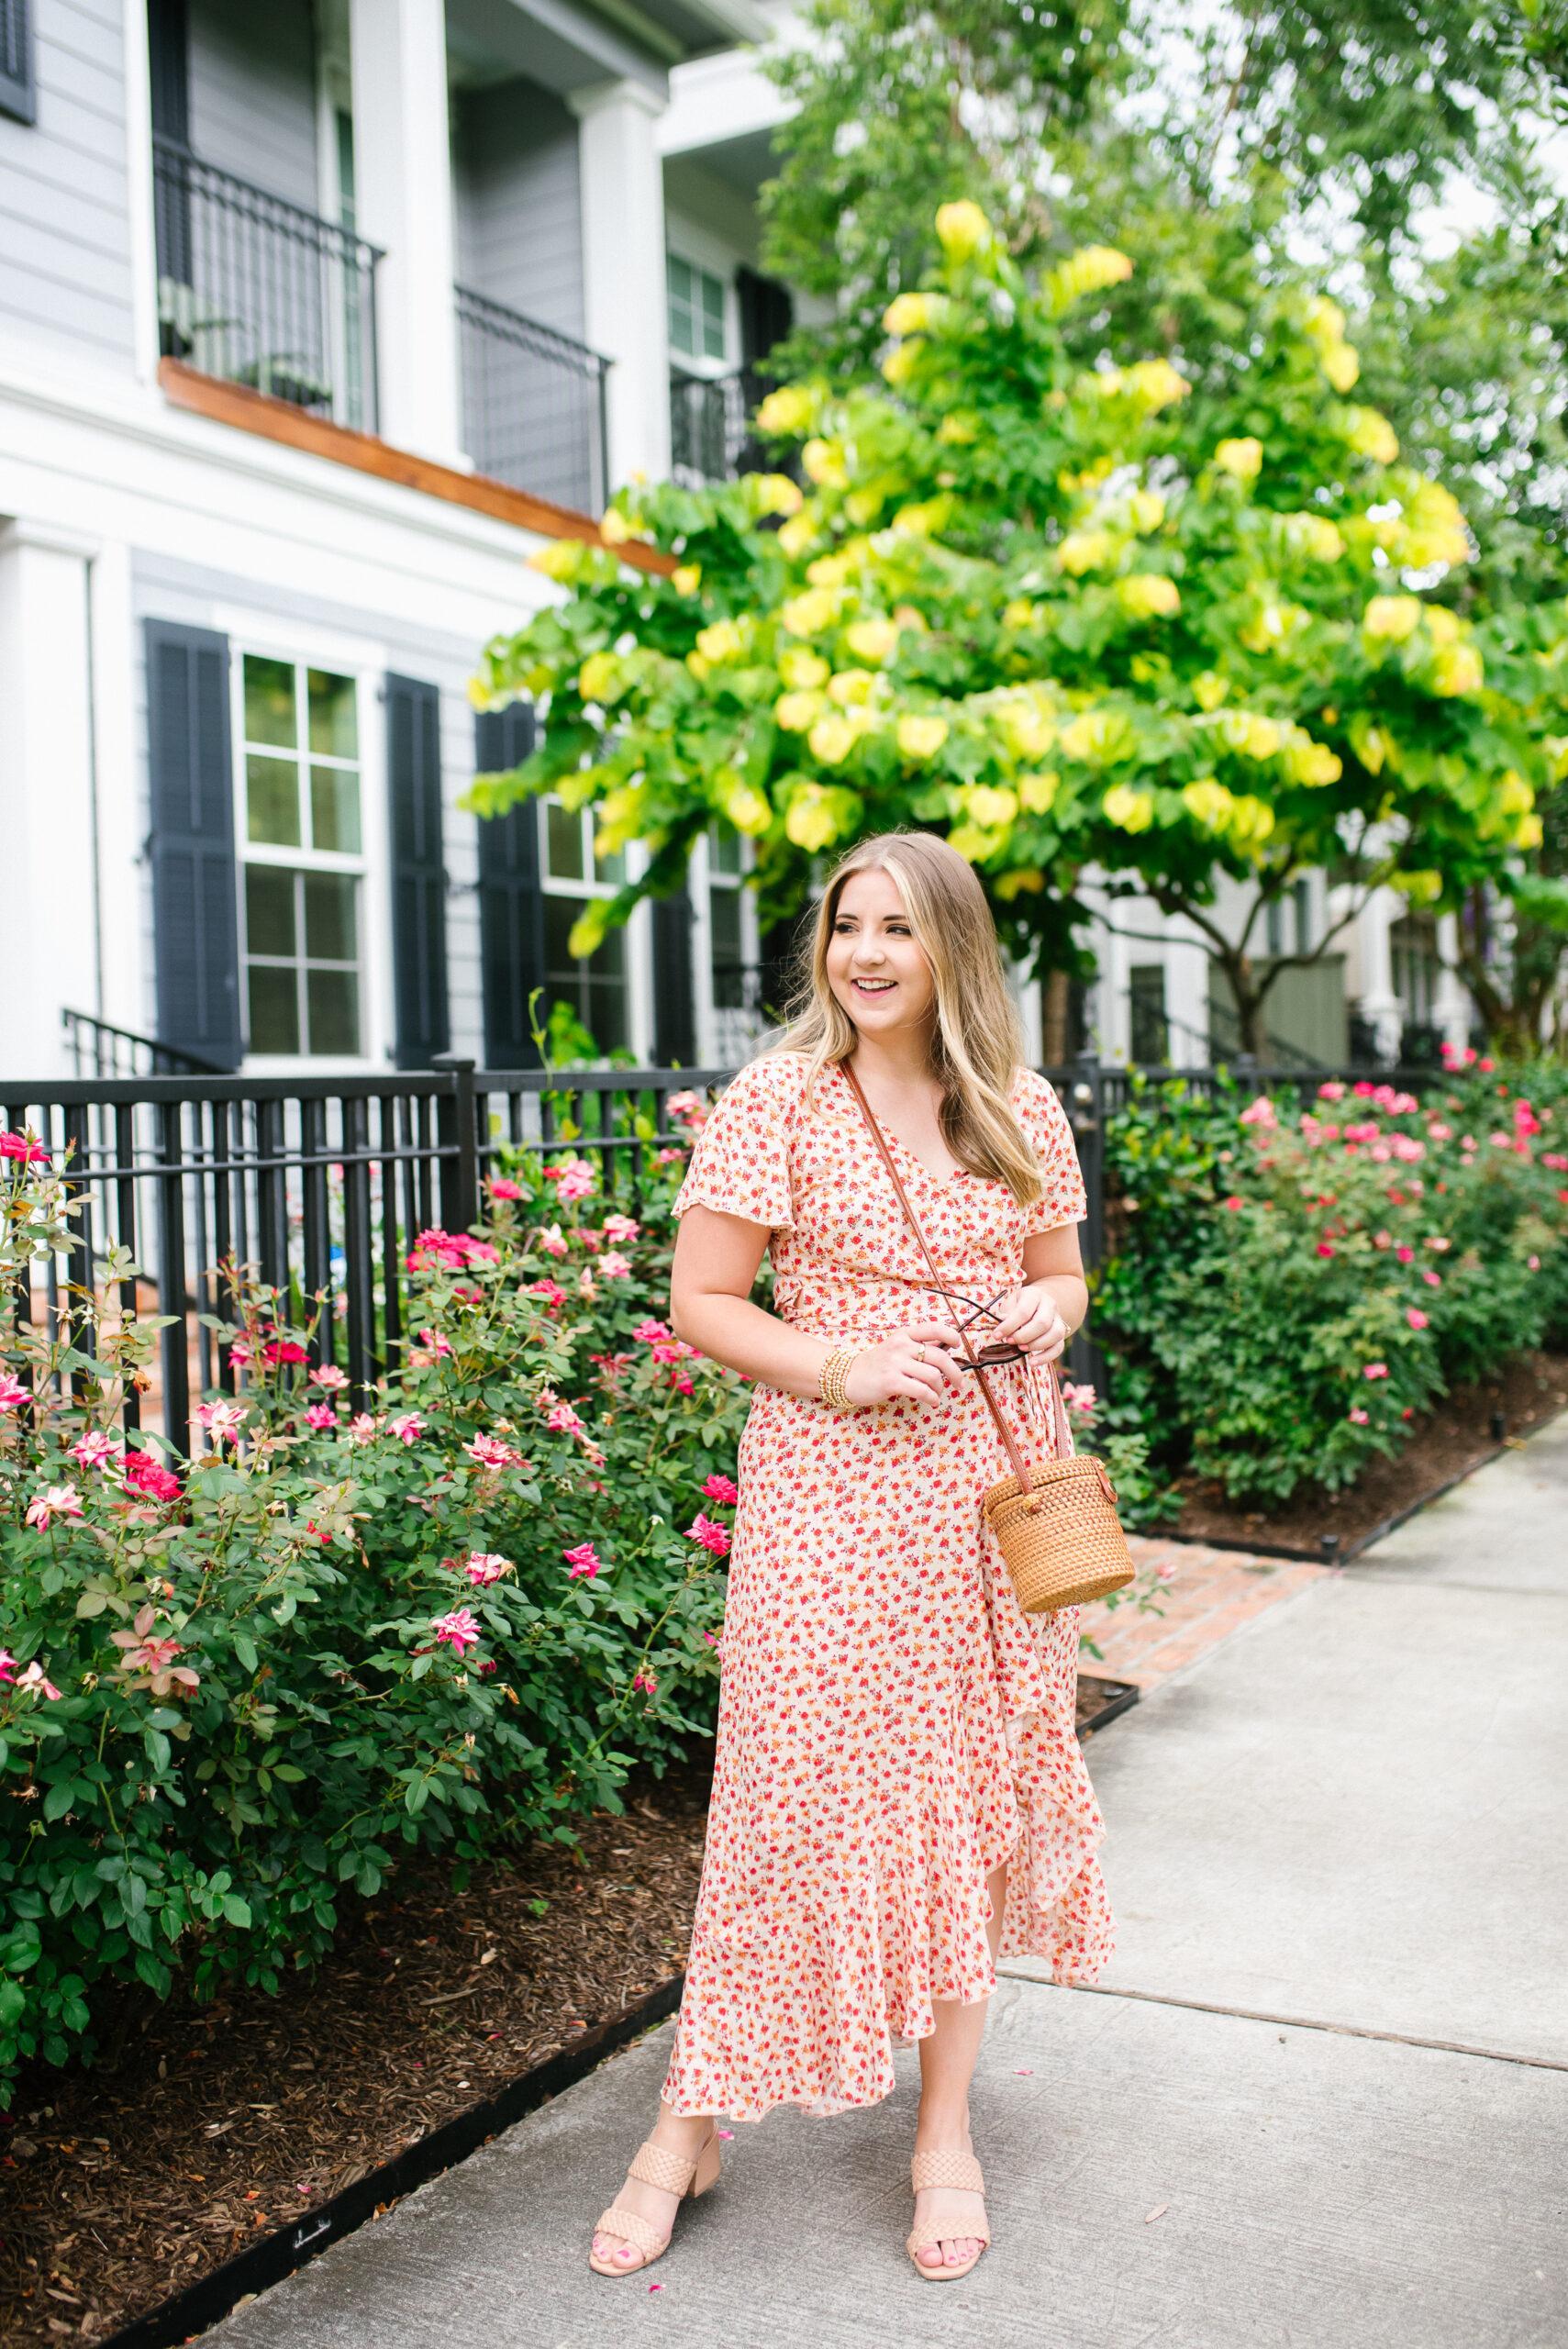 Amazon Wrap Dress for Summer